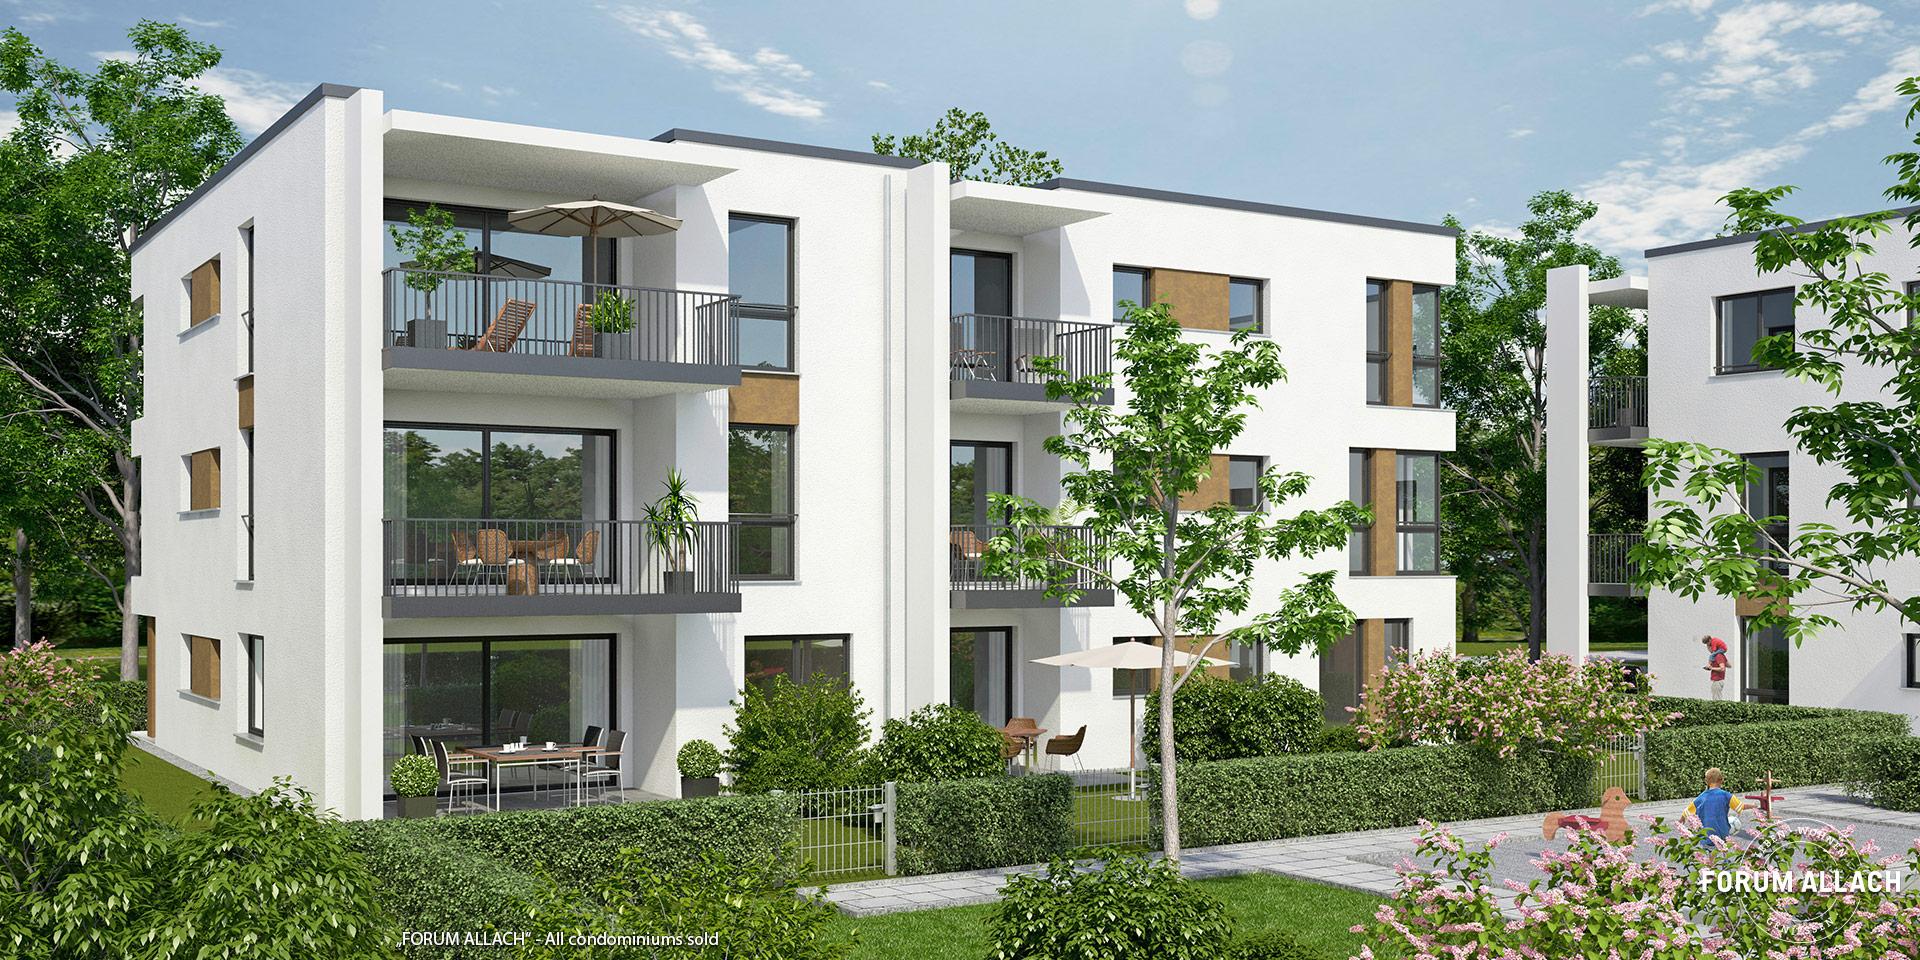 """FORUM ALLACH"" in Munich-Allach: All condominiums sold"